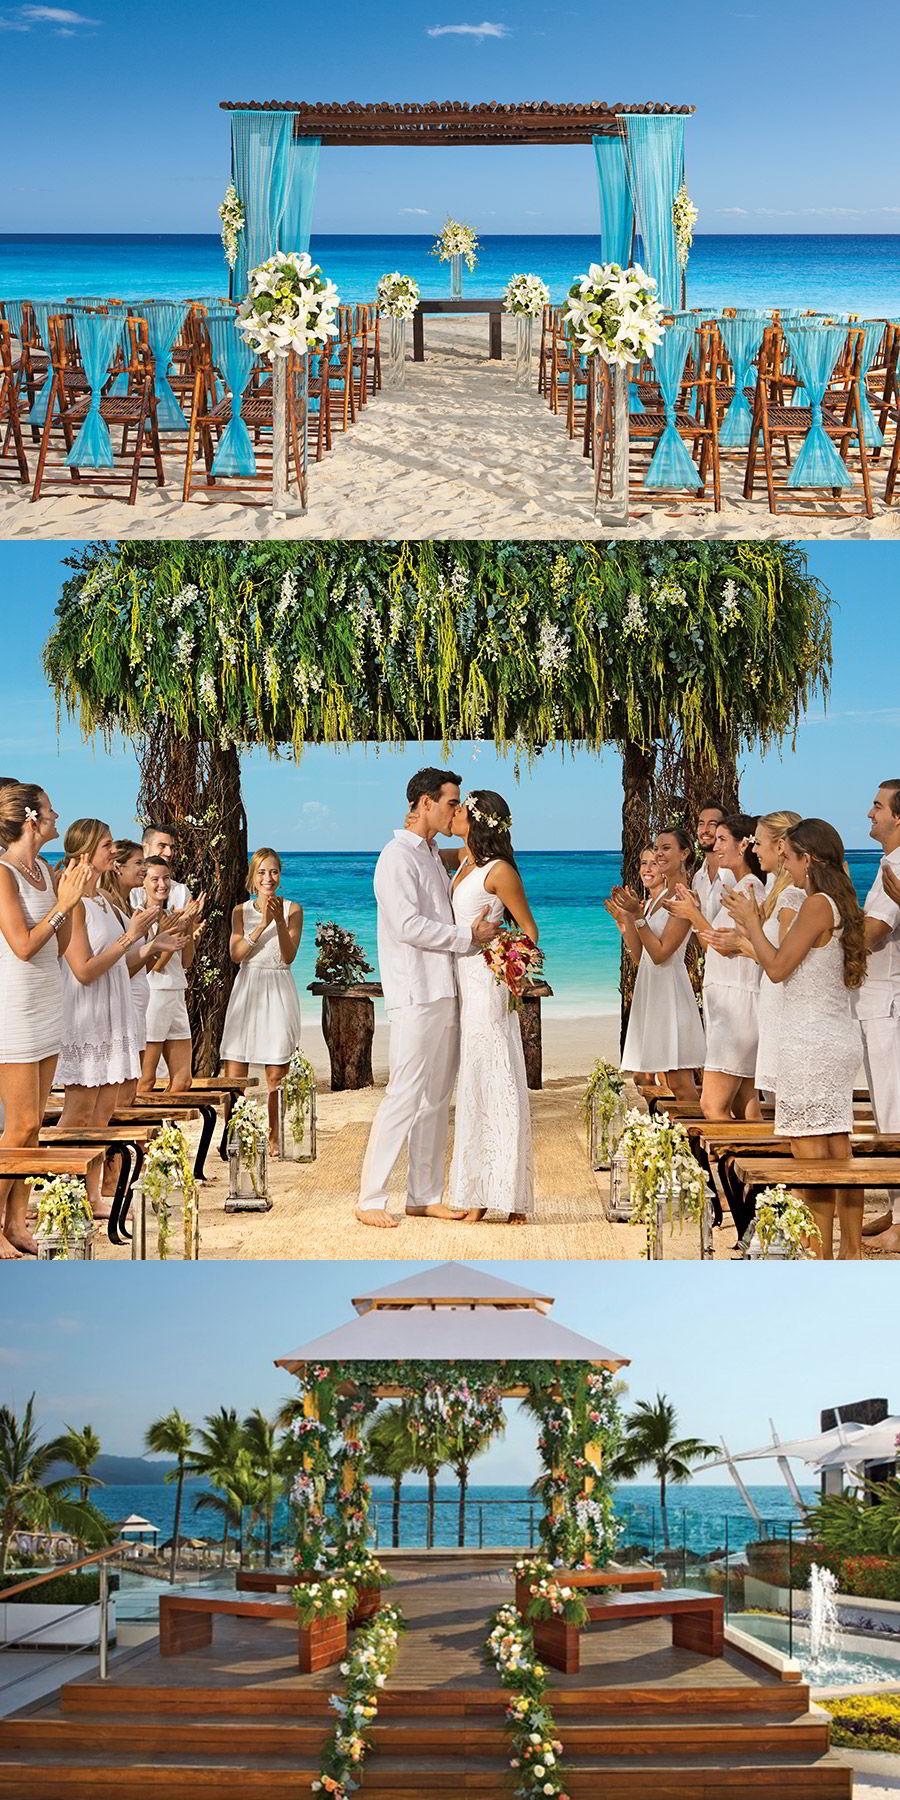 secrets resorts caribbean beach destination wedding luxury honeymoon beachfront barefoot wedding venue boho chic bohemian style beach nuptials capri akumal vallarta